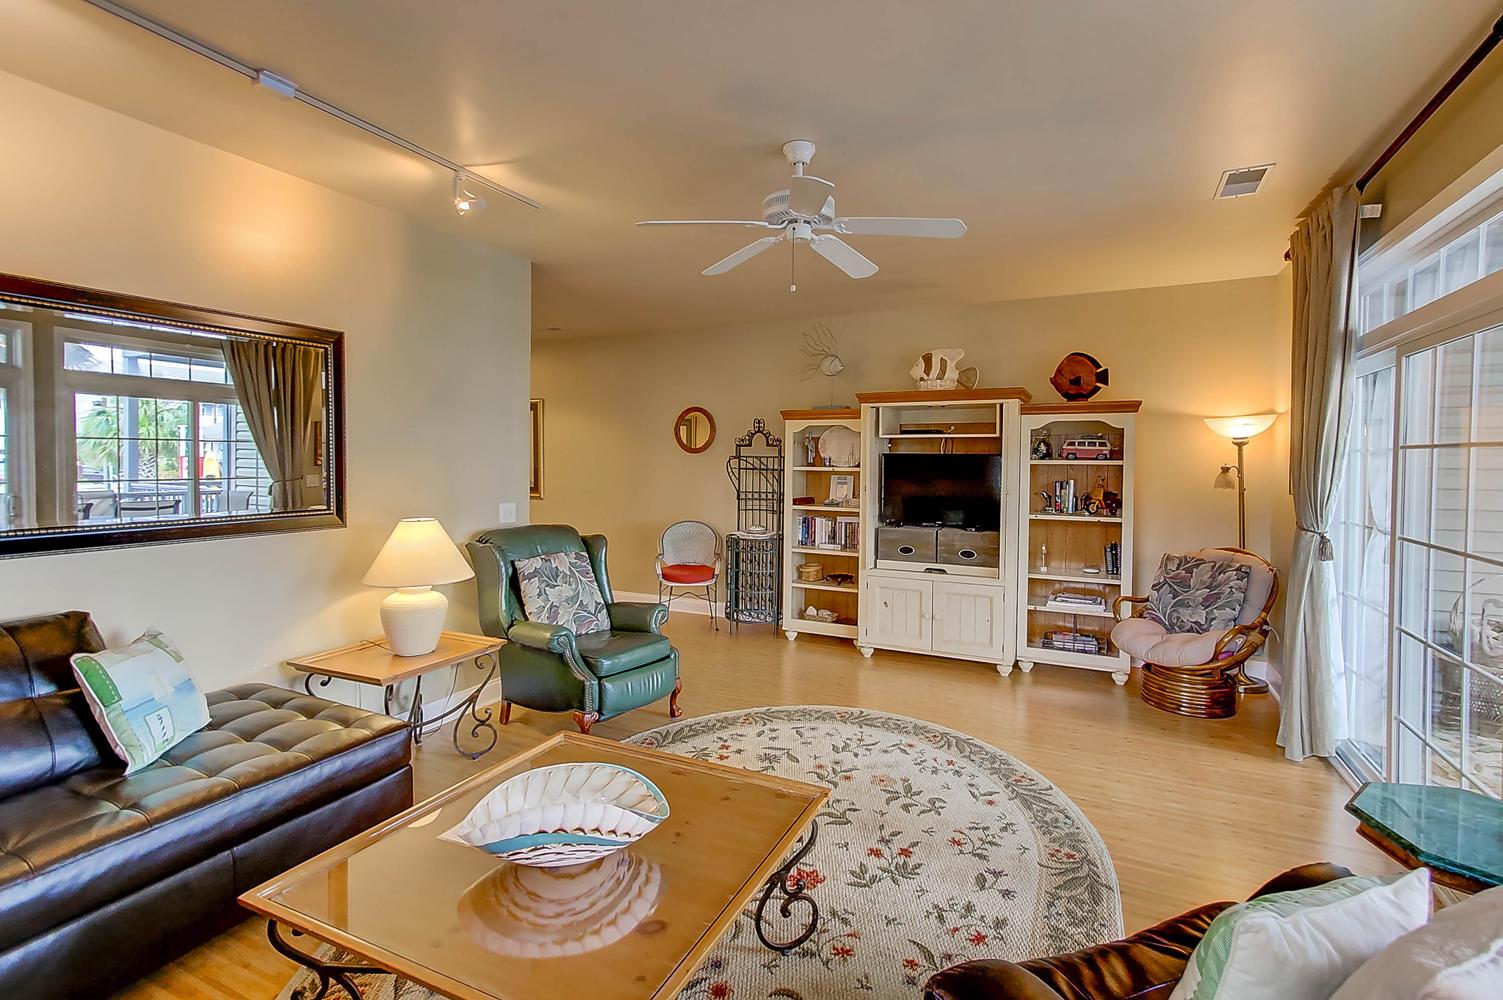 Beachwalker Villas Homes For Sale - 108 Ashley, Folly Beach, SC - 15